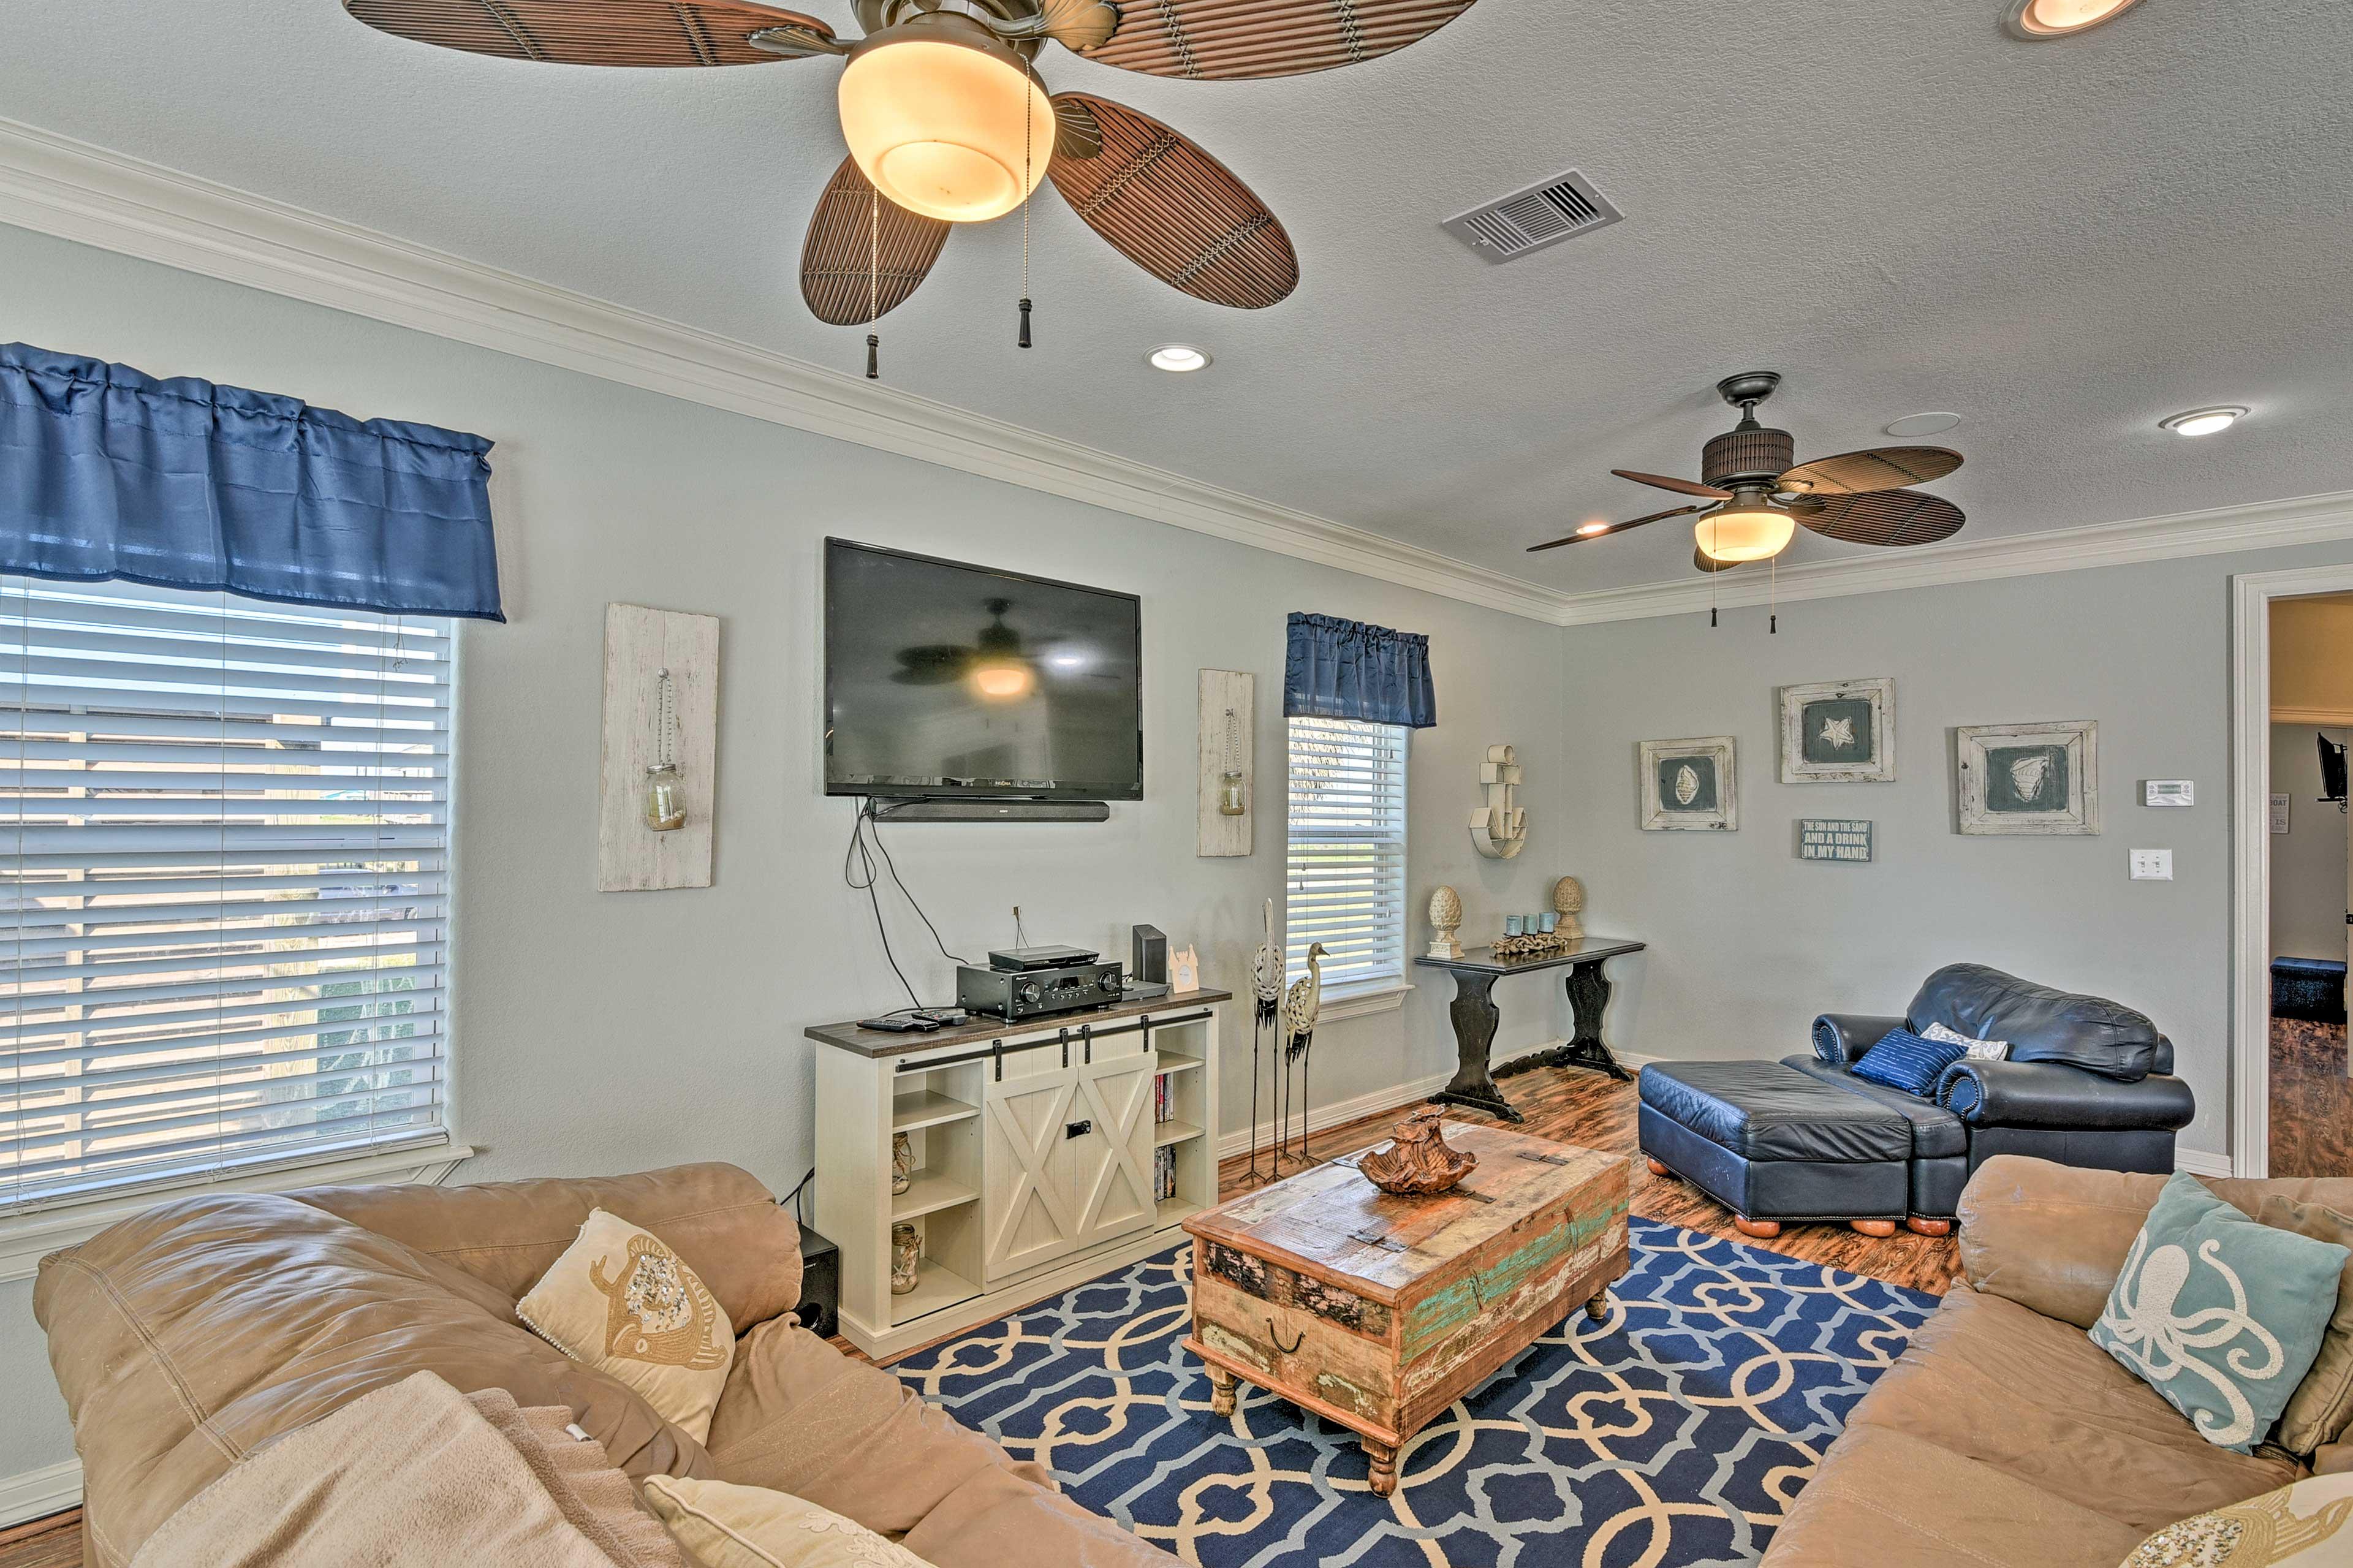 Living Room | Flat-Screen TV w/ Direct TV